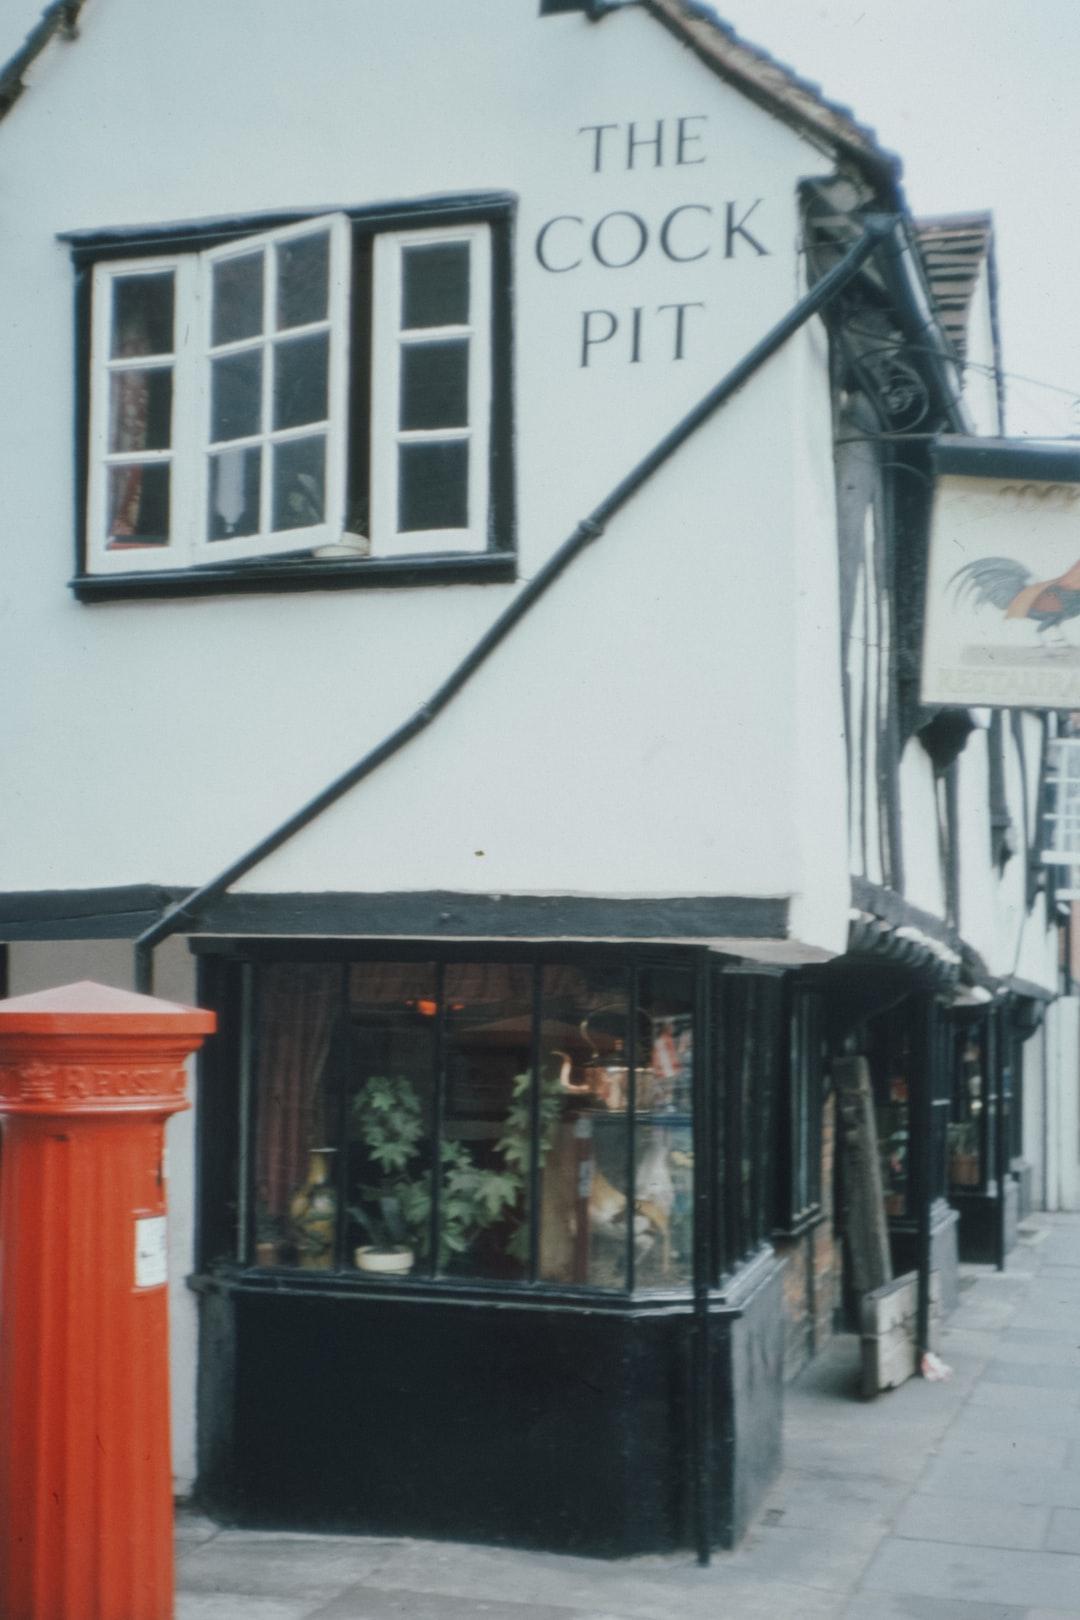 The Cock Pit pub, Eton High Street, 1970s 35mm film slide photo